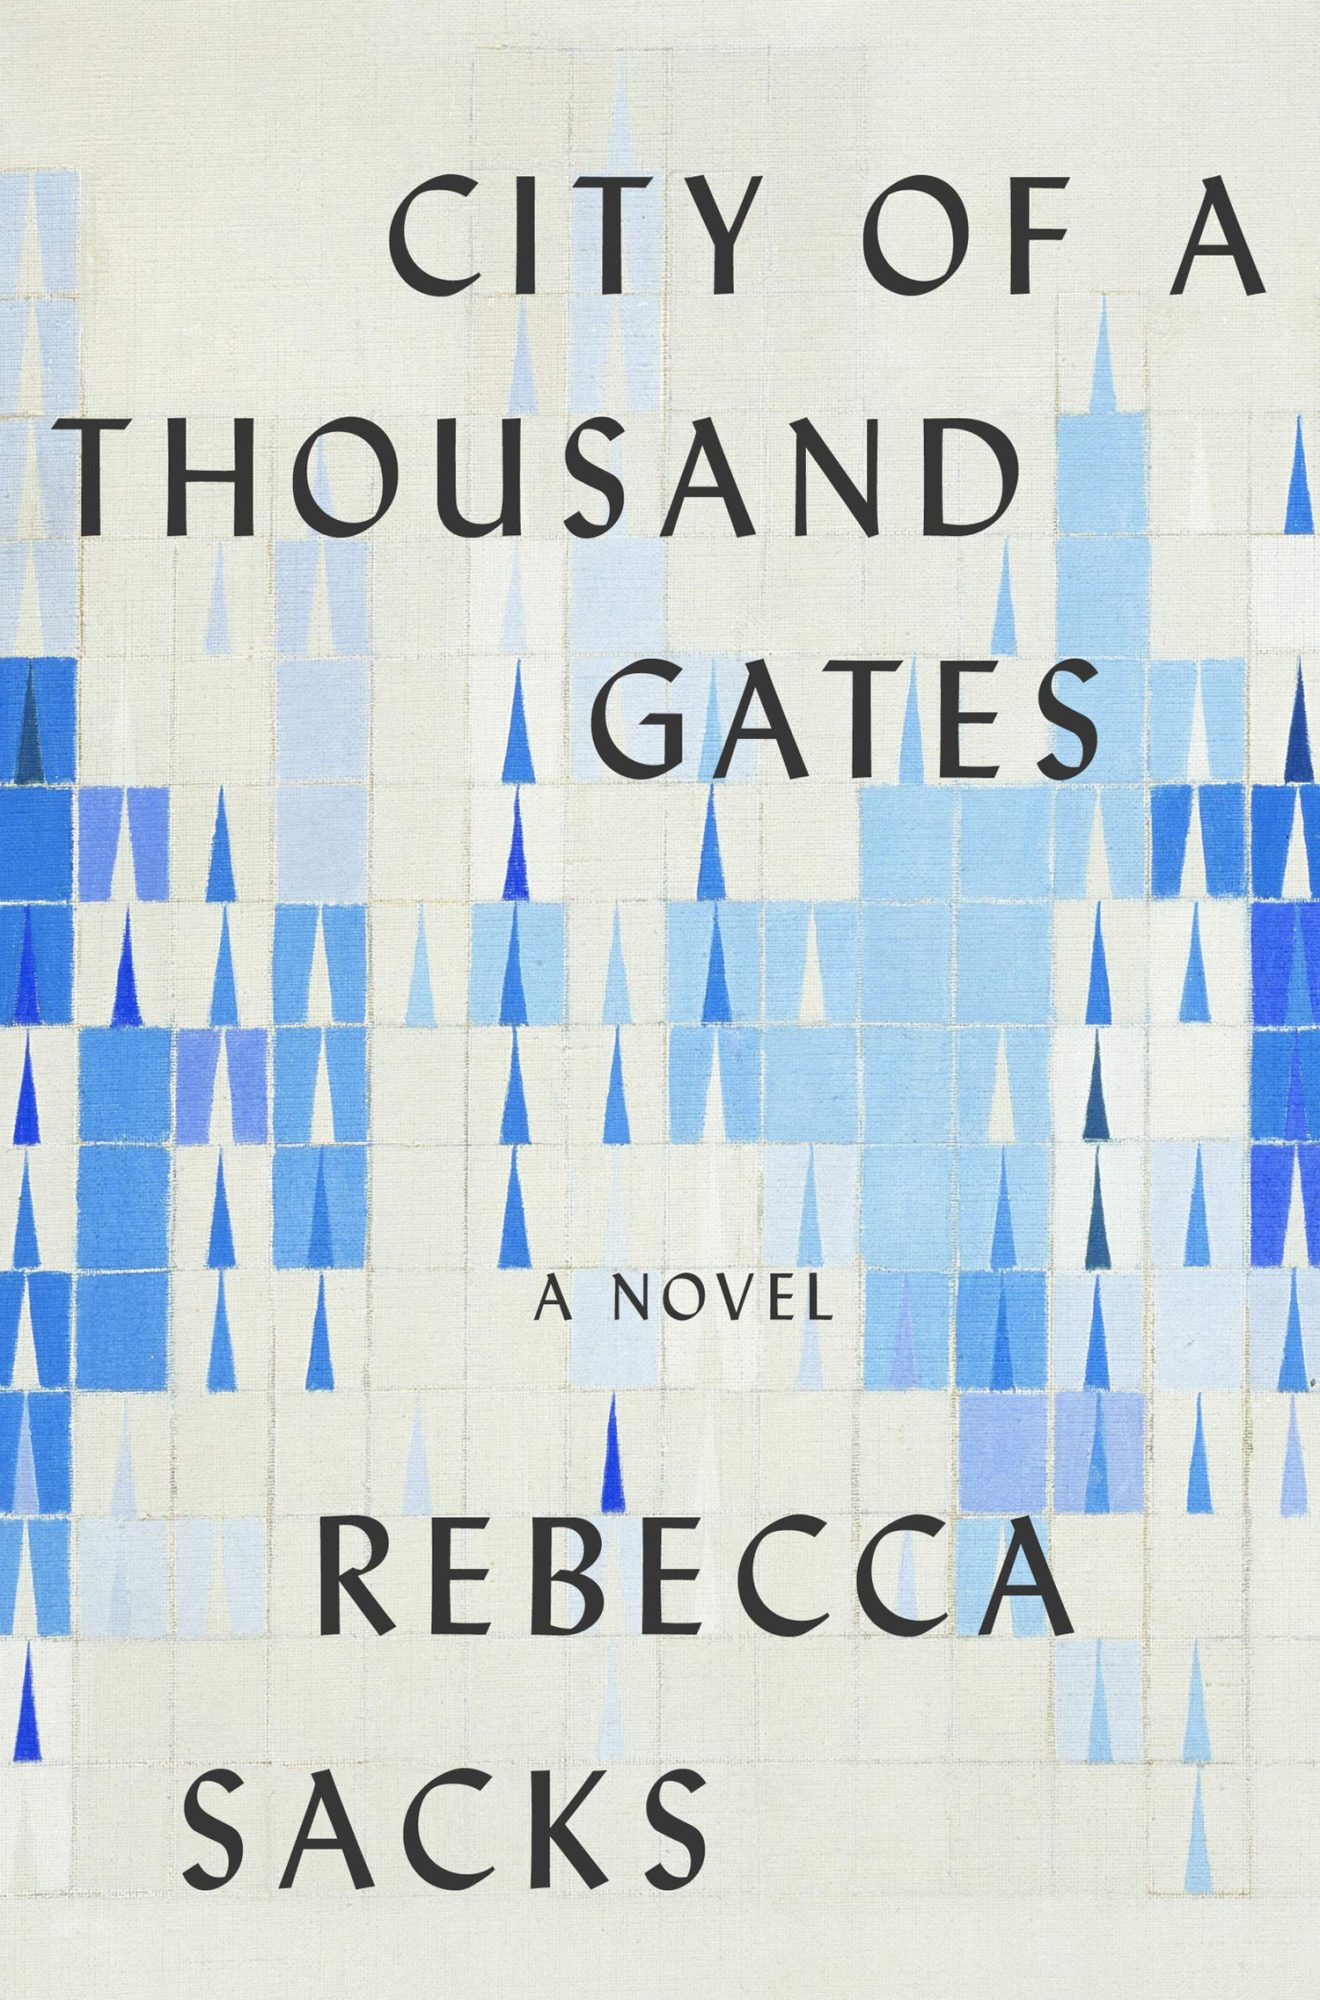 City of a Thousand Gates: A Novel by Rebecca Sacks